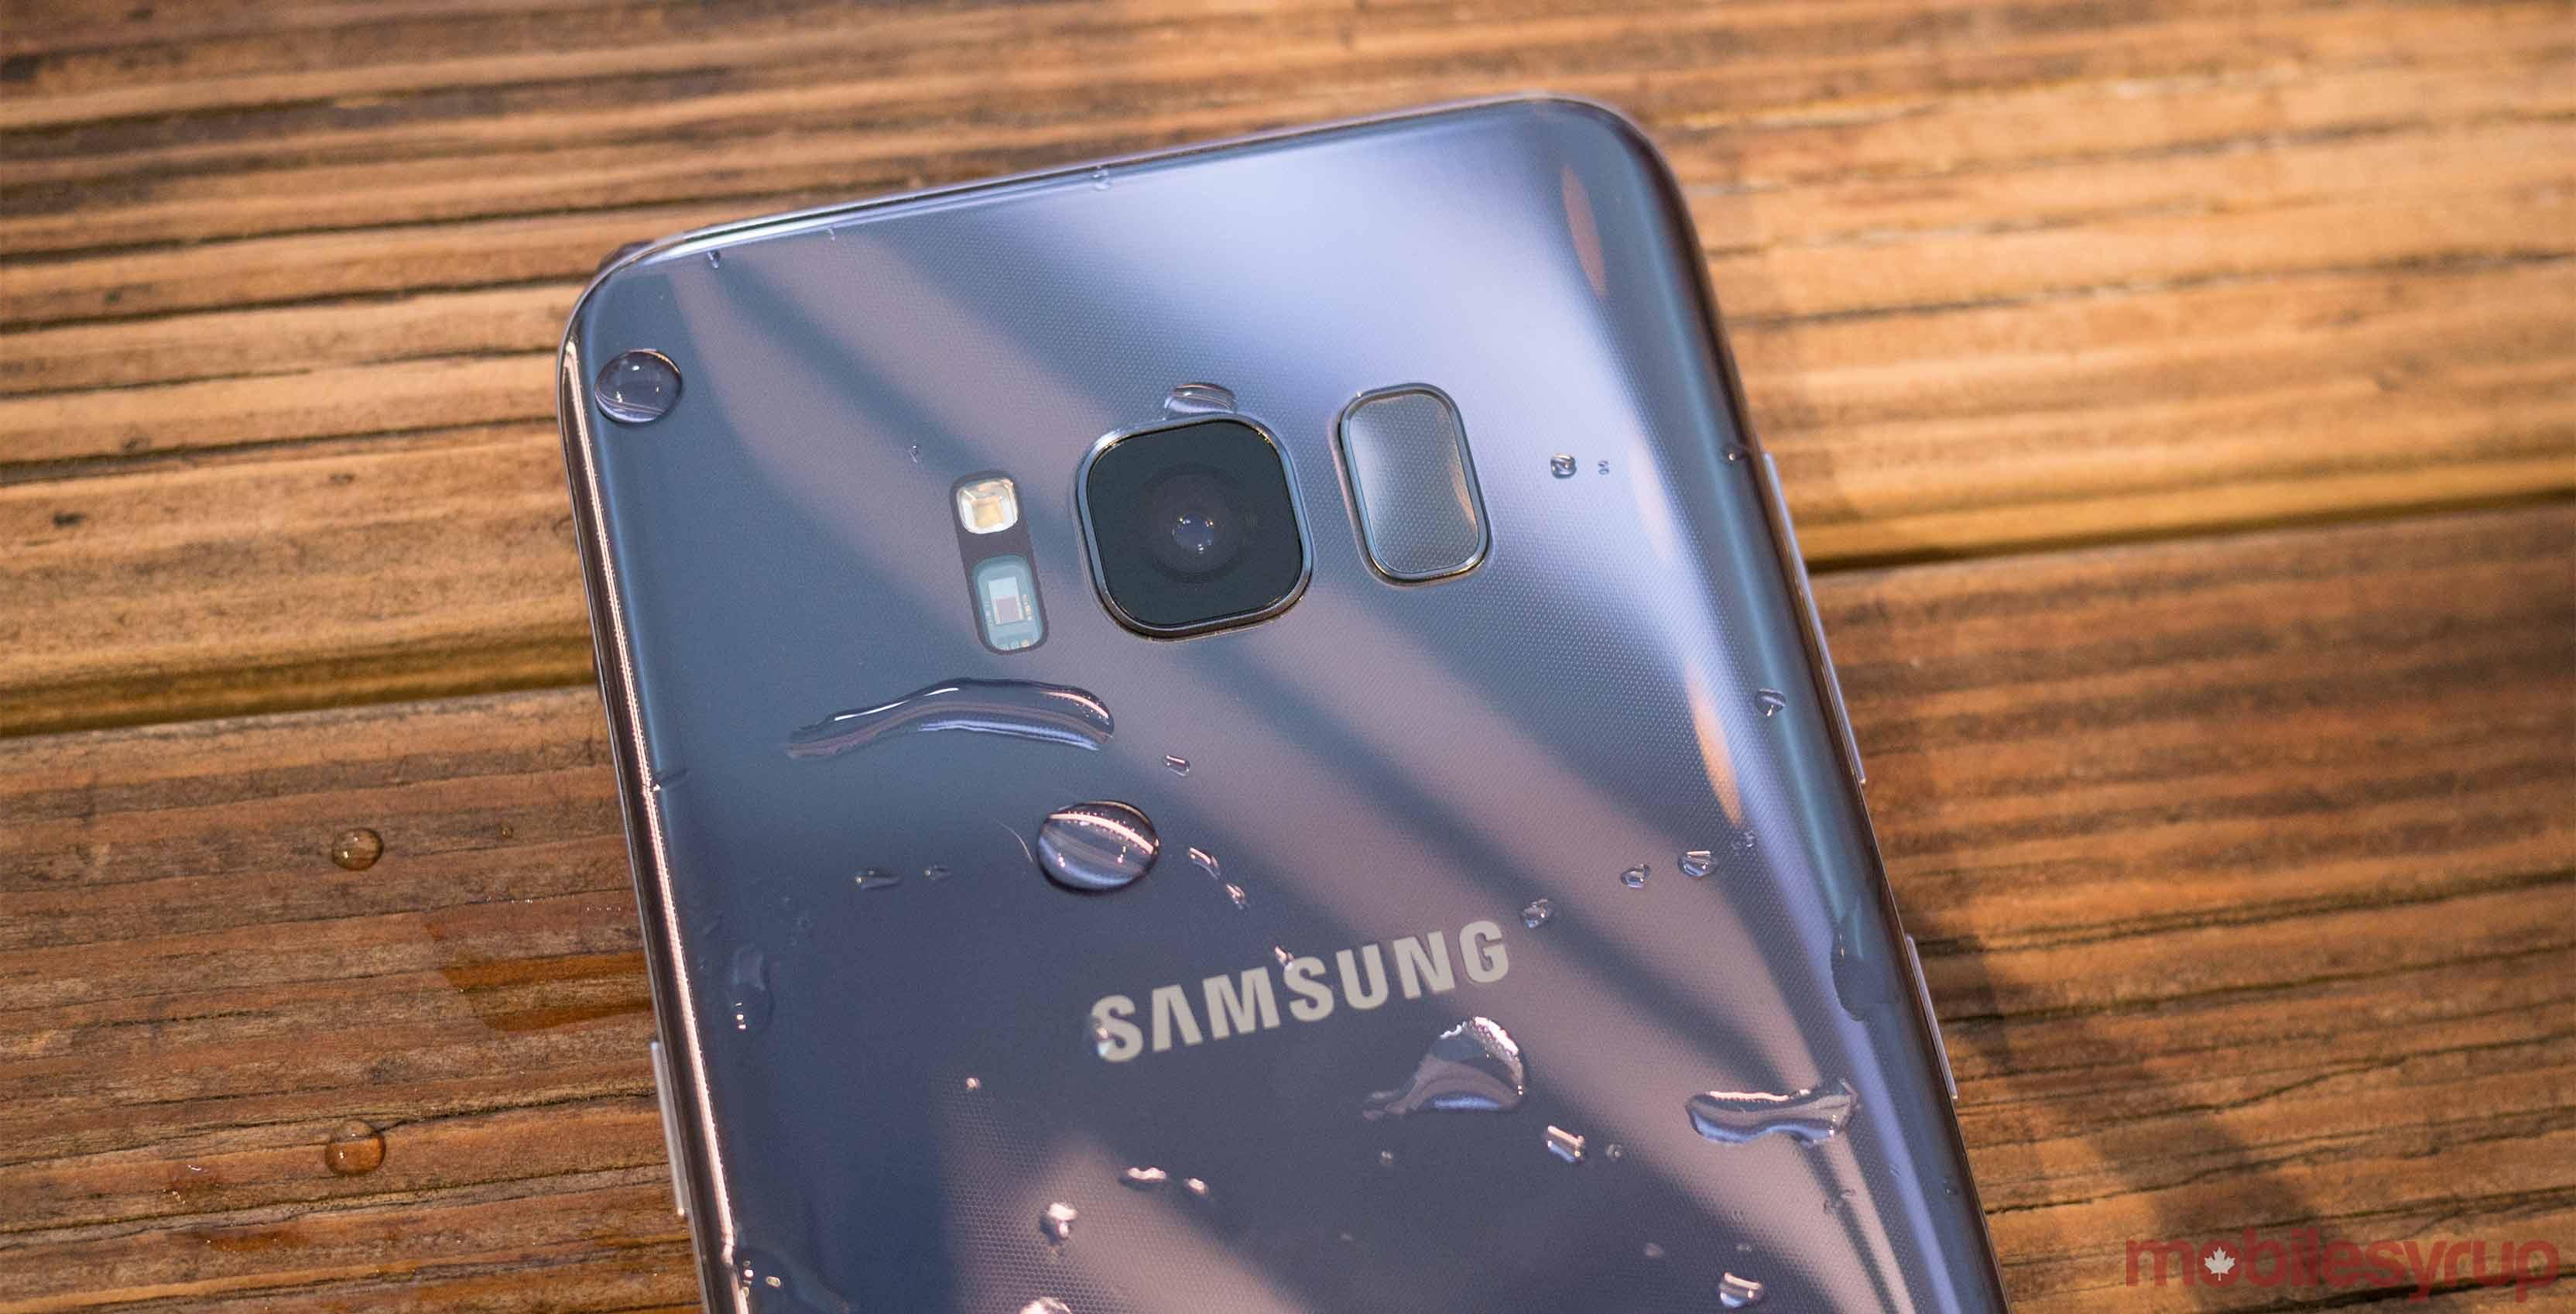 Samsung Galaxy S8+ production